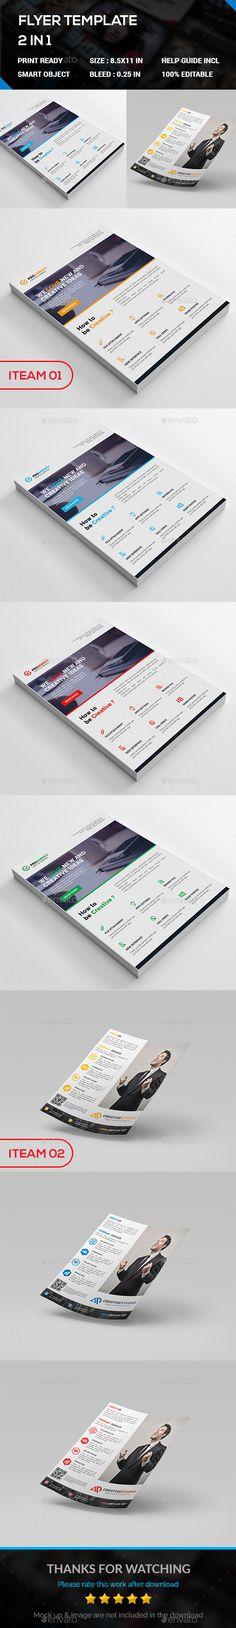 Corporate Modern Flyer Desig Template - Corporate Flyer Template PSD. Download here: https://graphicriver.net/item/modern-flyer/17428346?ref=yinkira